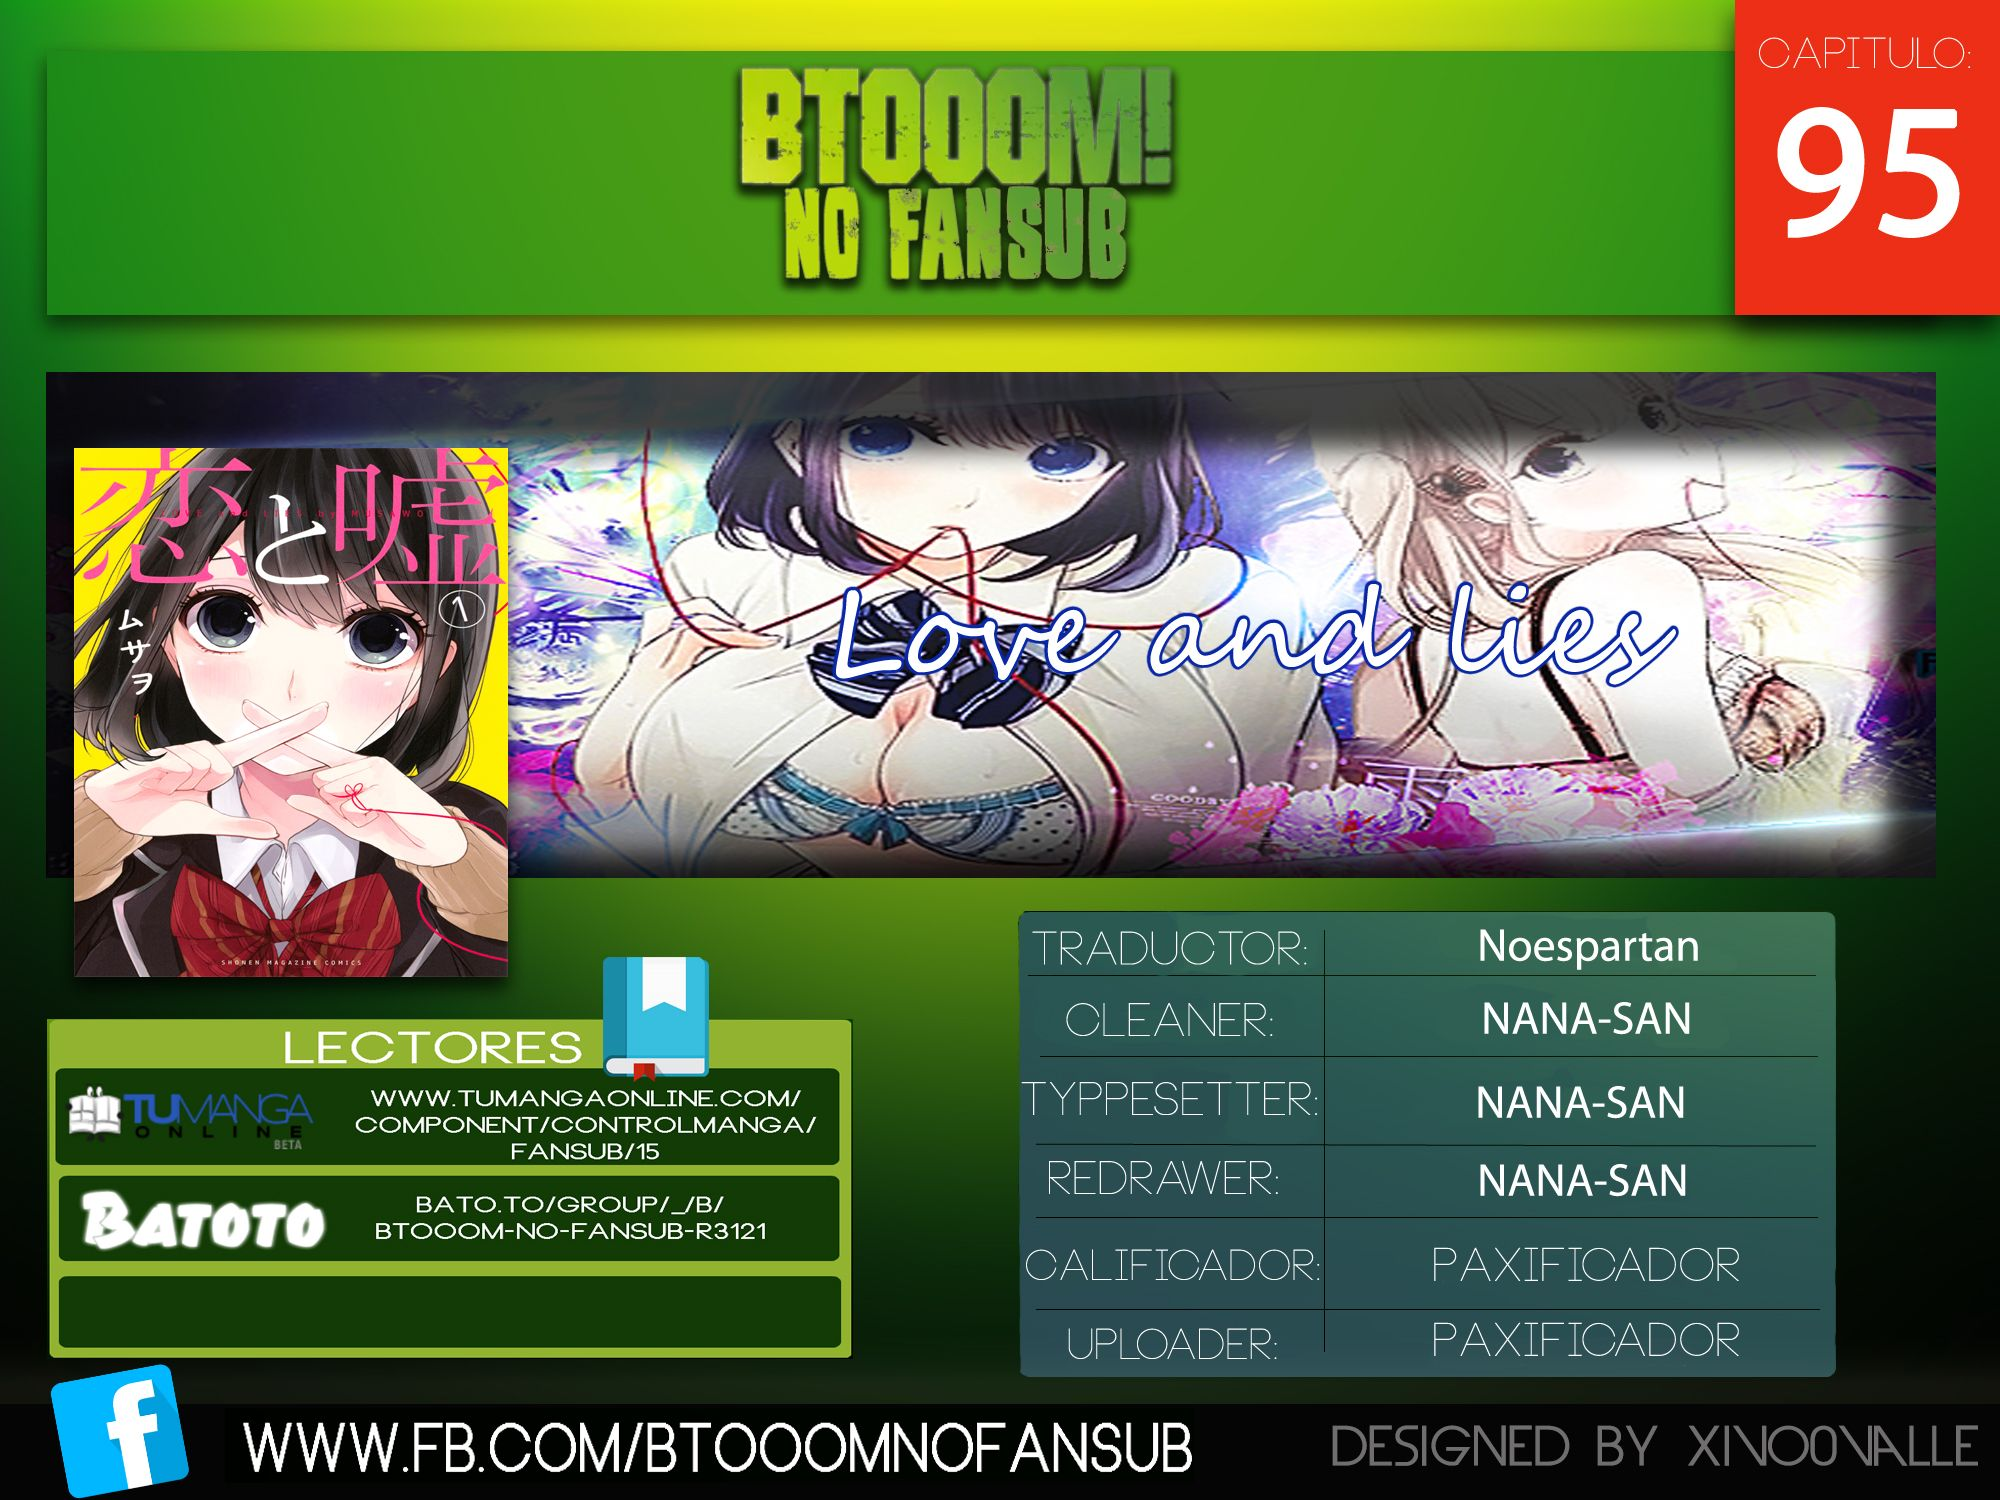 http://c5.ninemanga.com/es_manga/14/14734/484945/922650f43f77a6fe2fcdbbe4558727e3.jpg Page 1